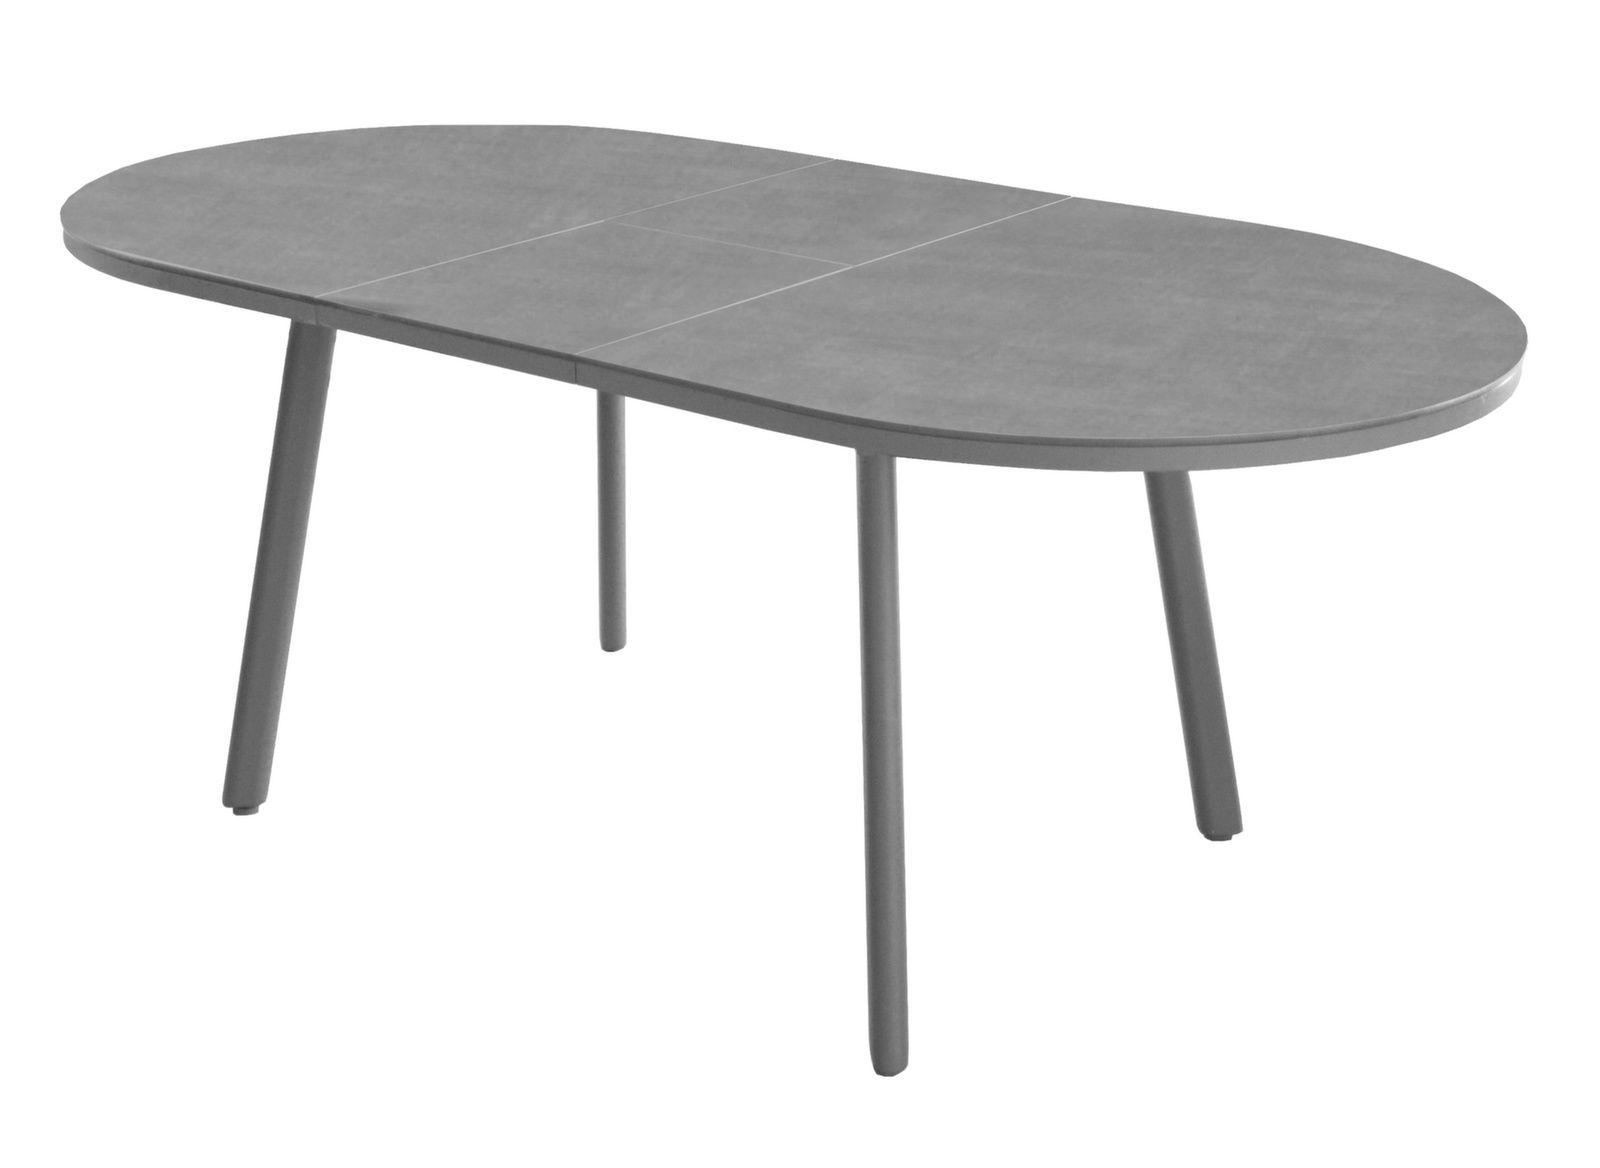 table de jardin aluminium bilbao 160 200 cm gamme oc o proloisirs. Black Bedroom Furniture Sets. Home Design Ideas